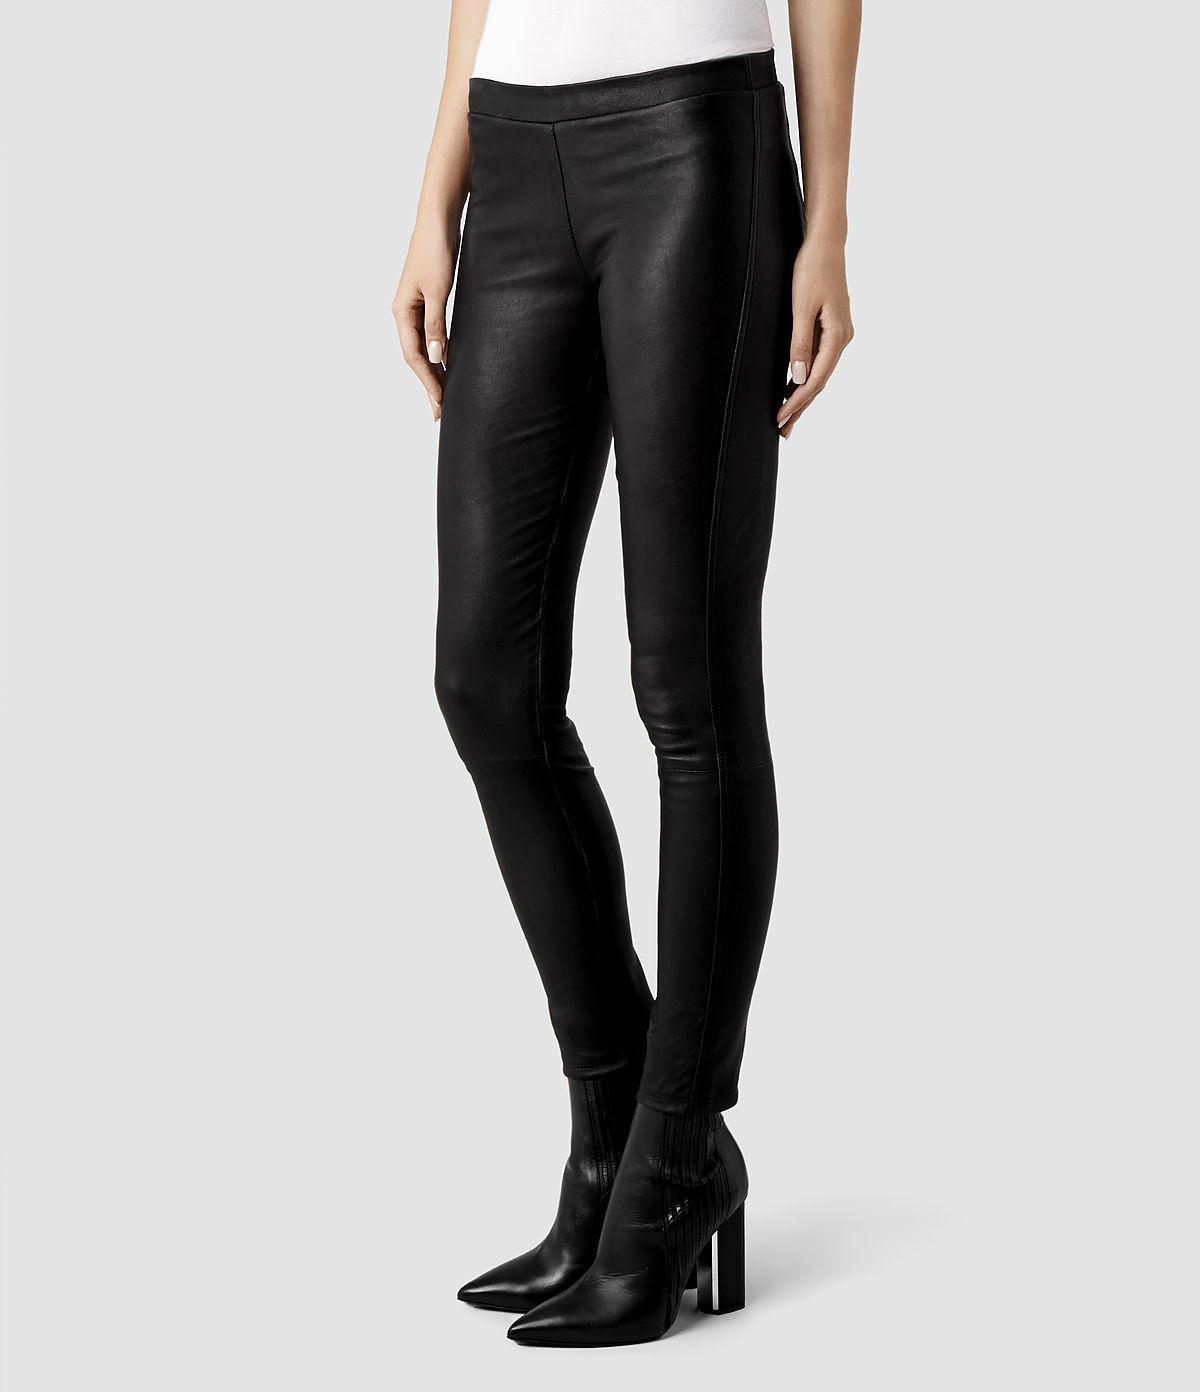 Allsaints Elm Leather Leggings In Black Lyst